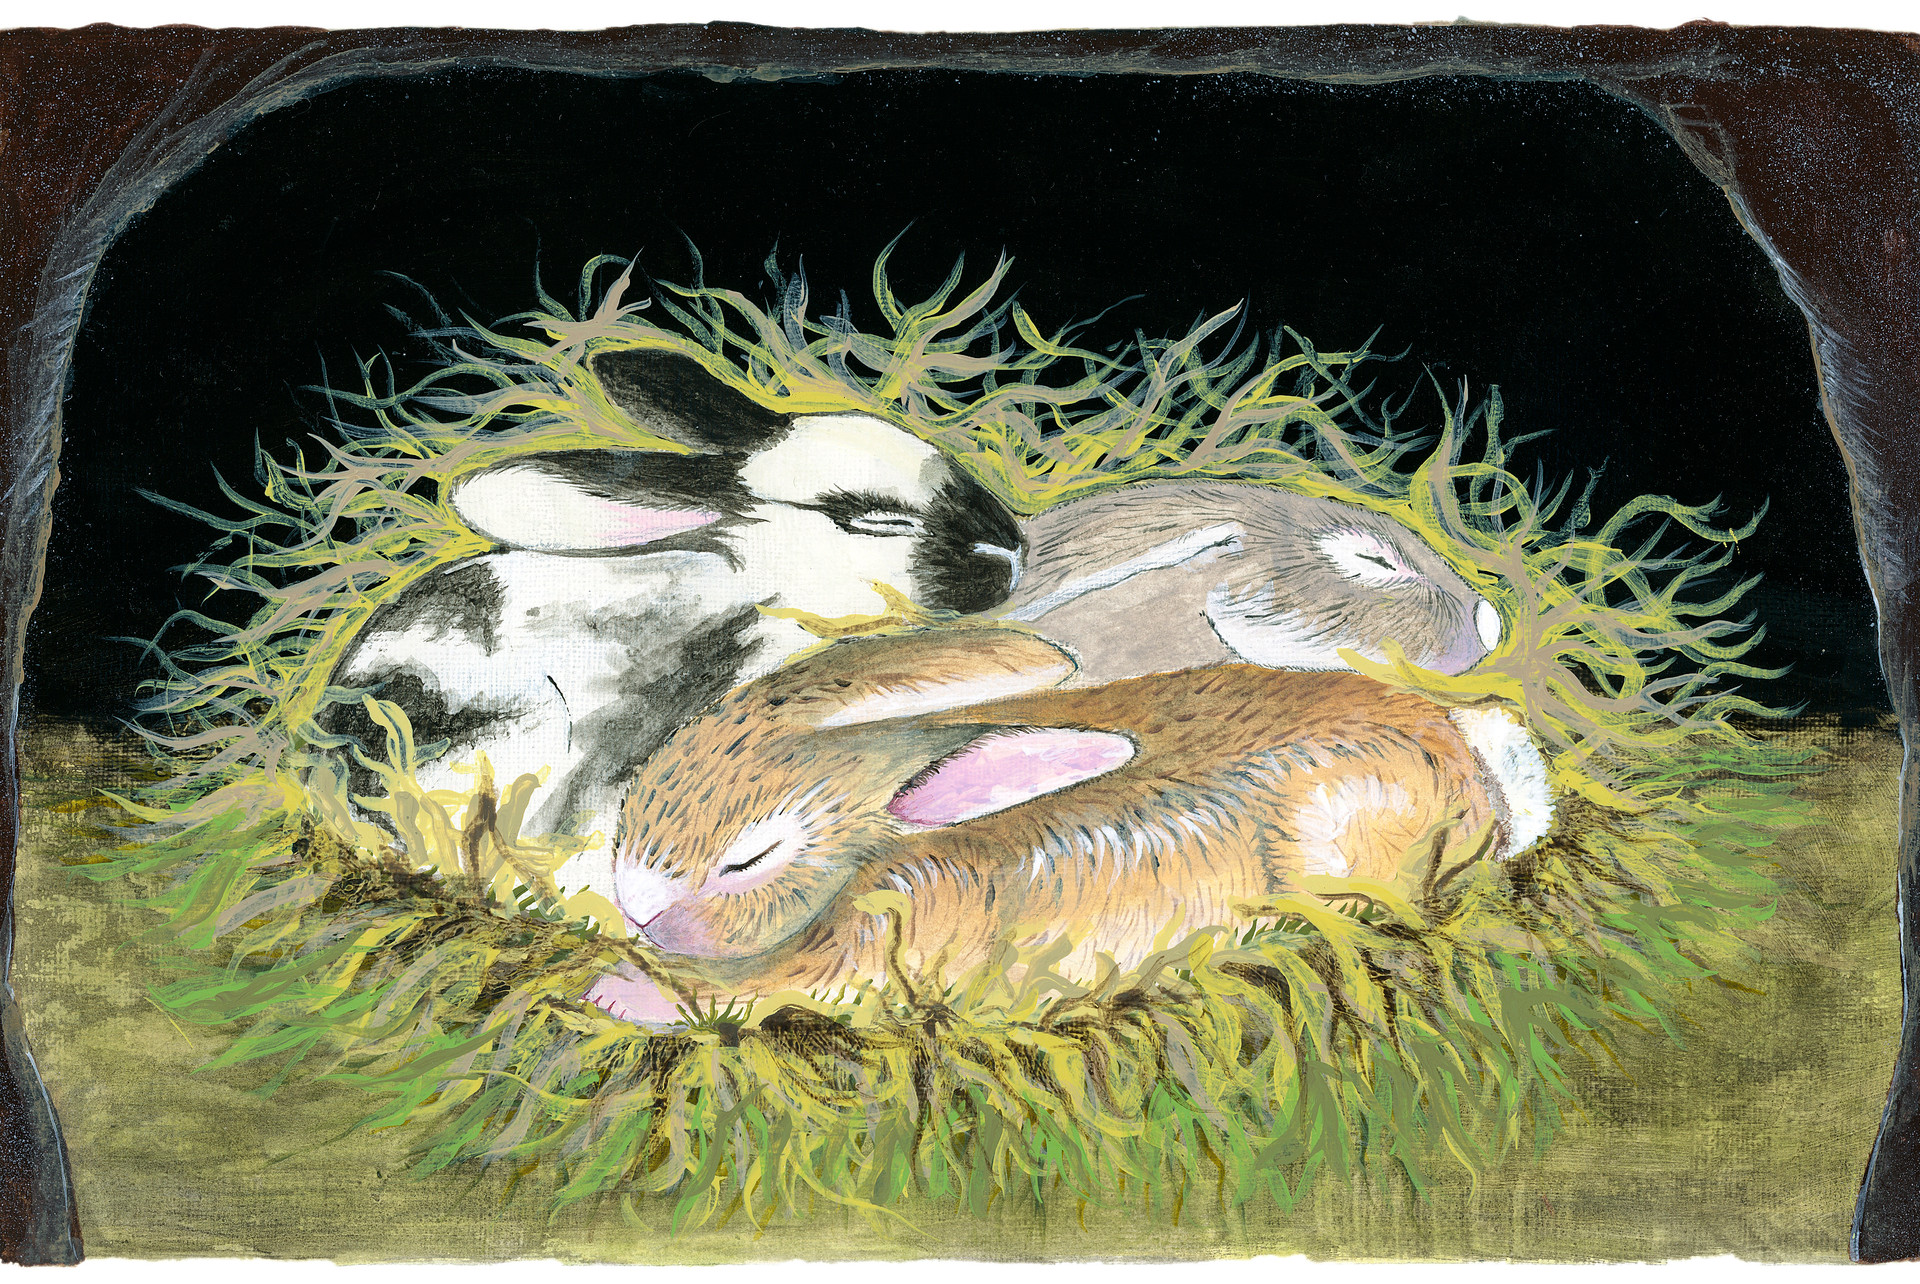 Asleep in the Burrow